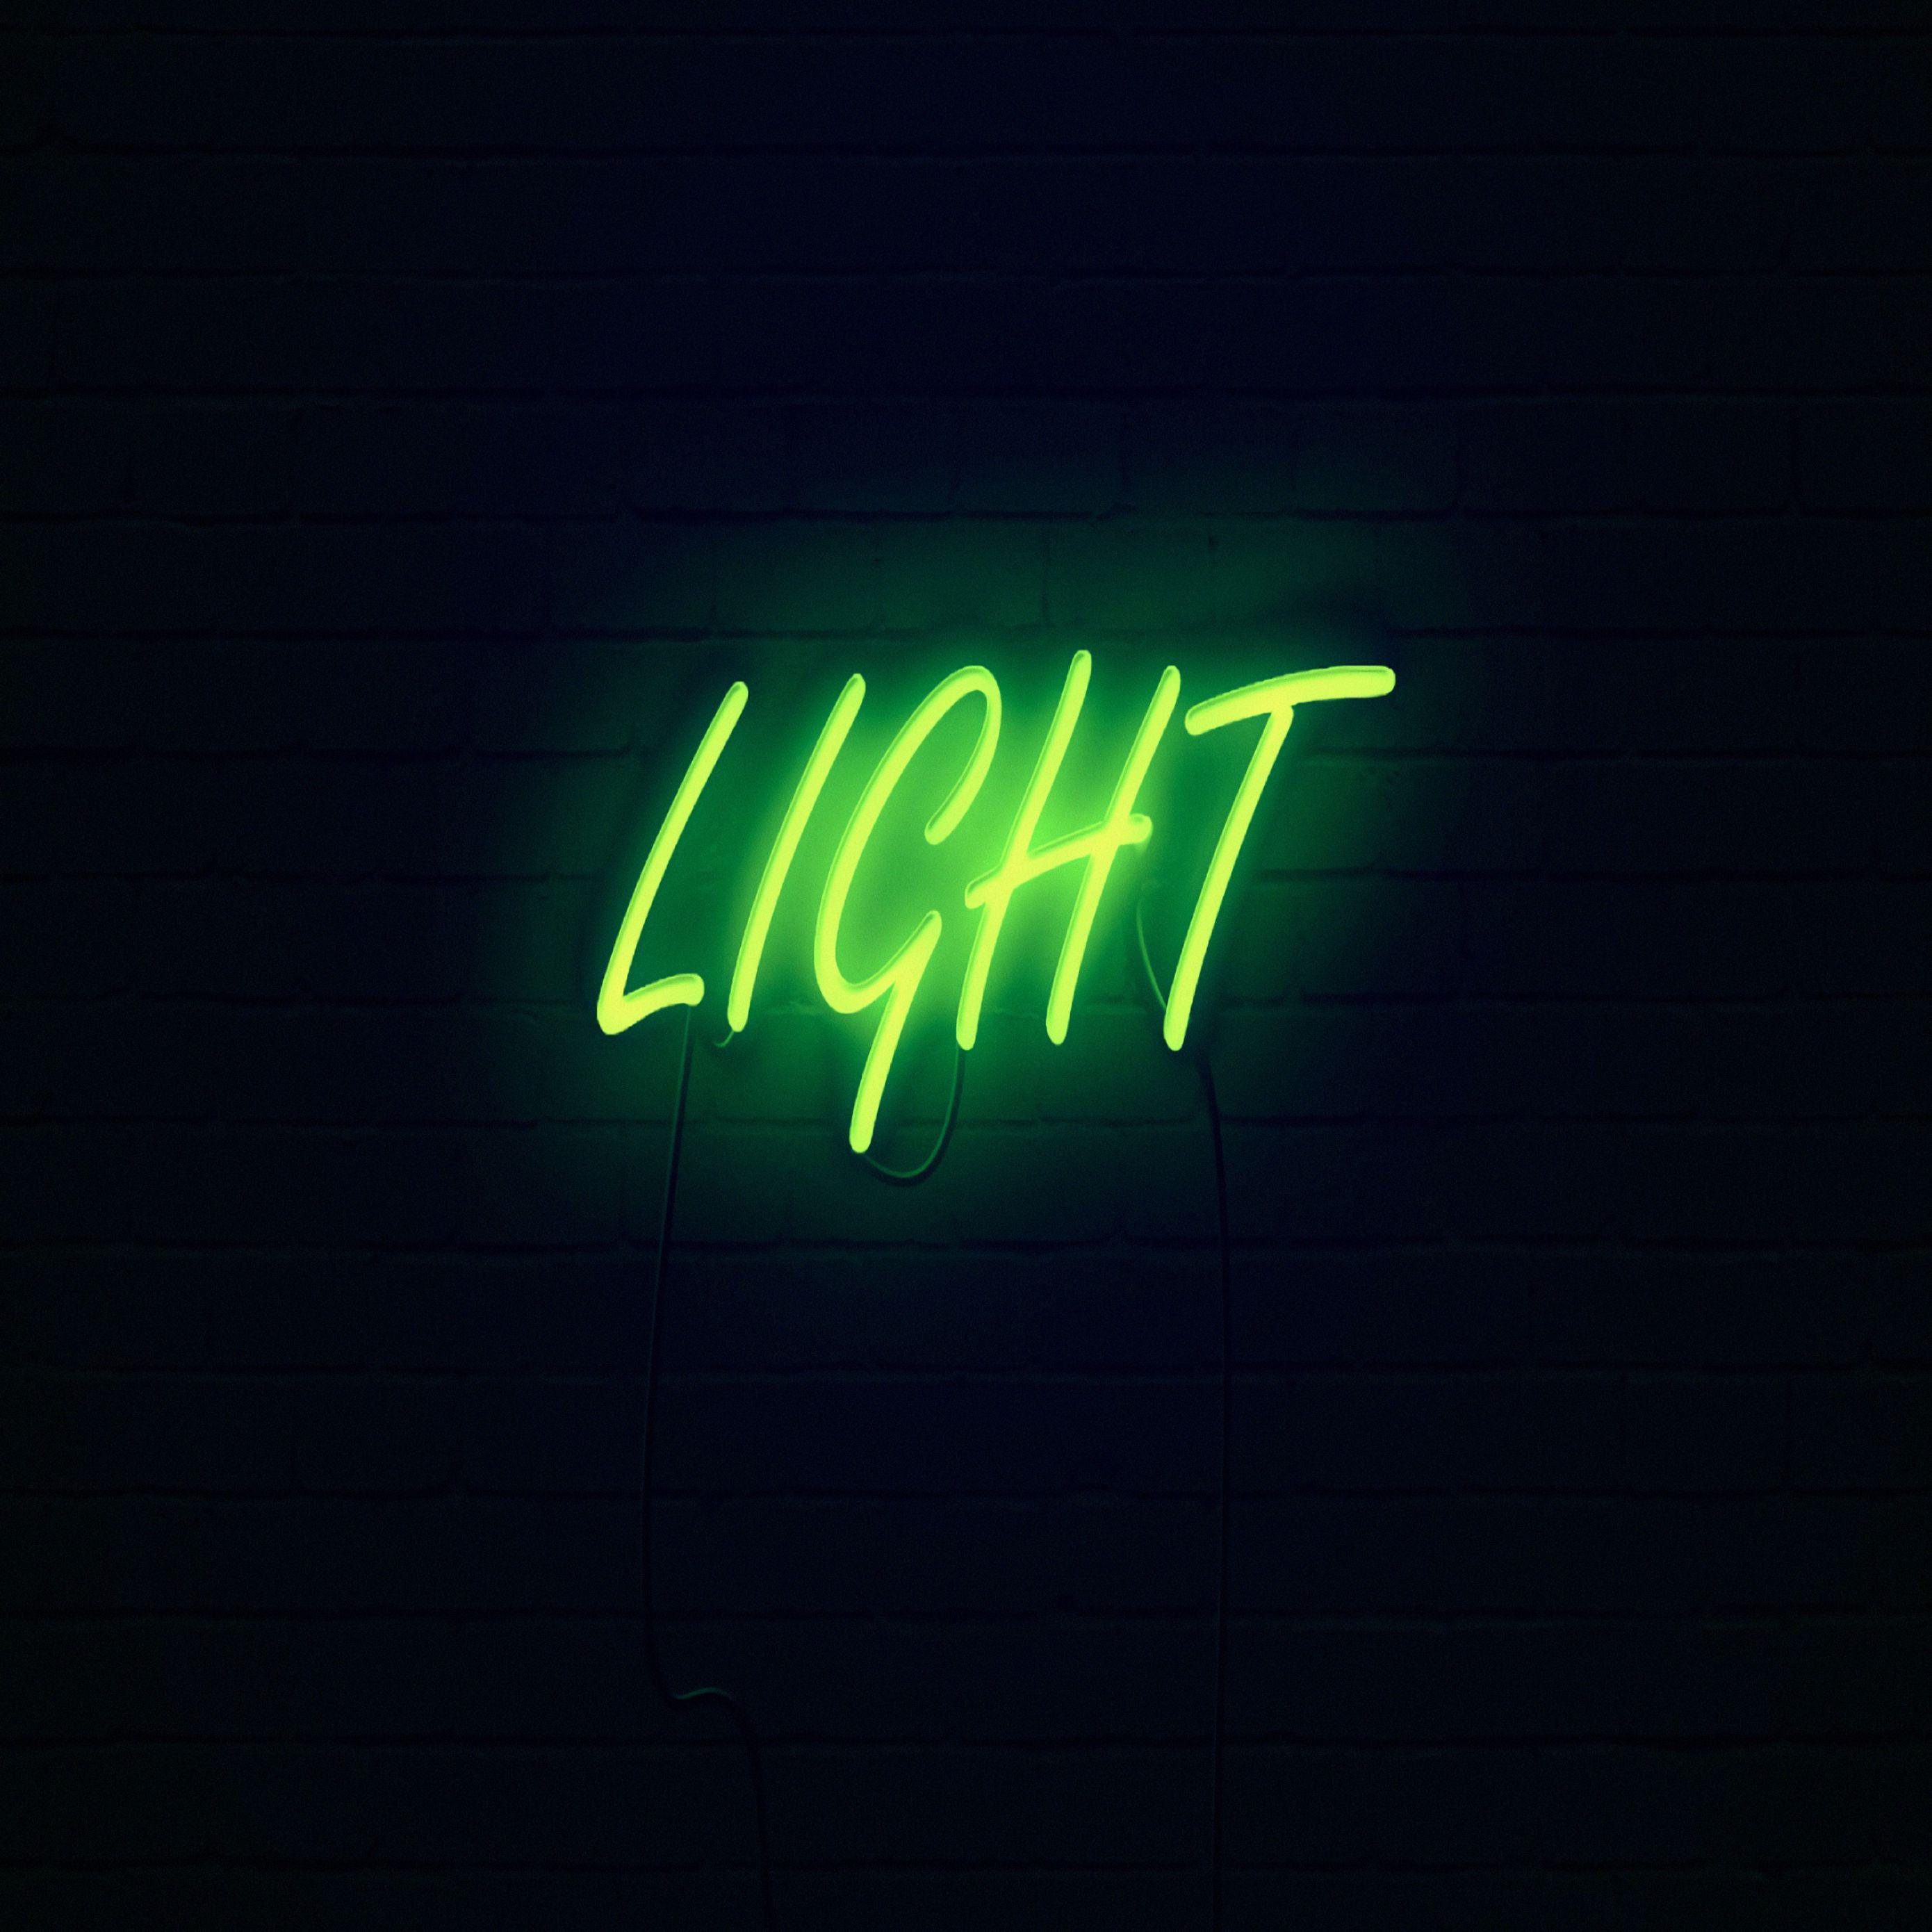 2780x2780 Wallpaper light, neon, inscription, dark, yellow